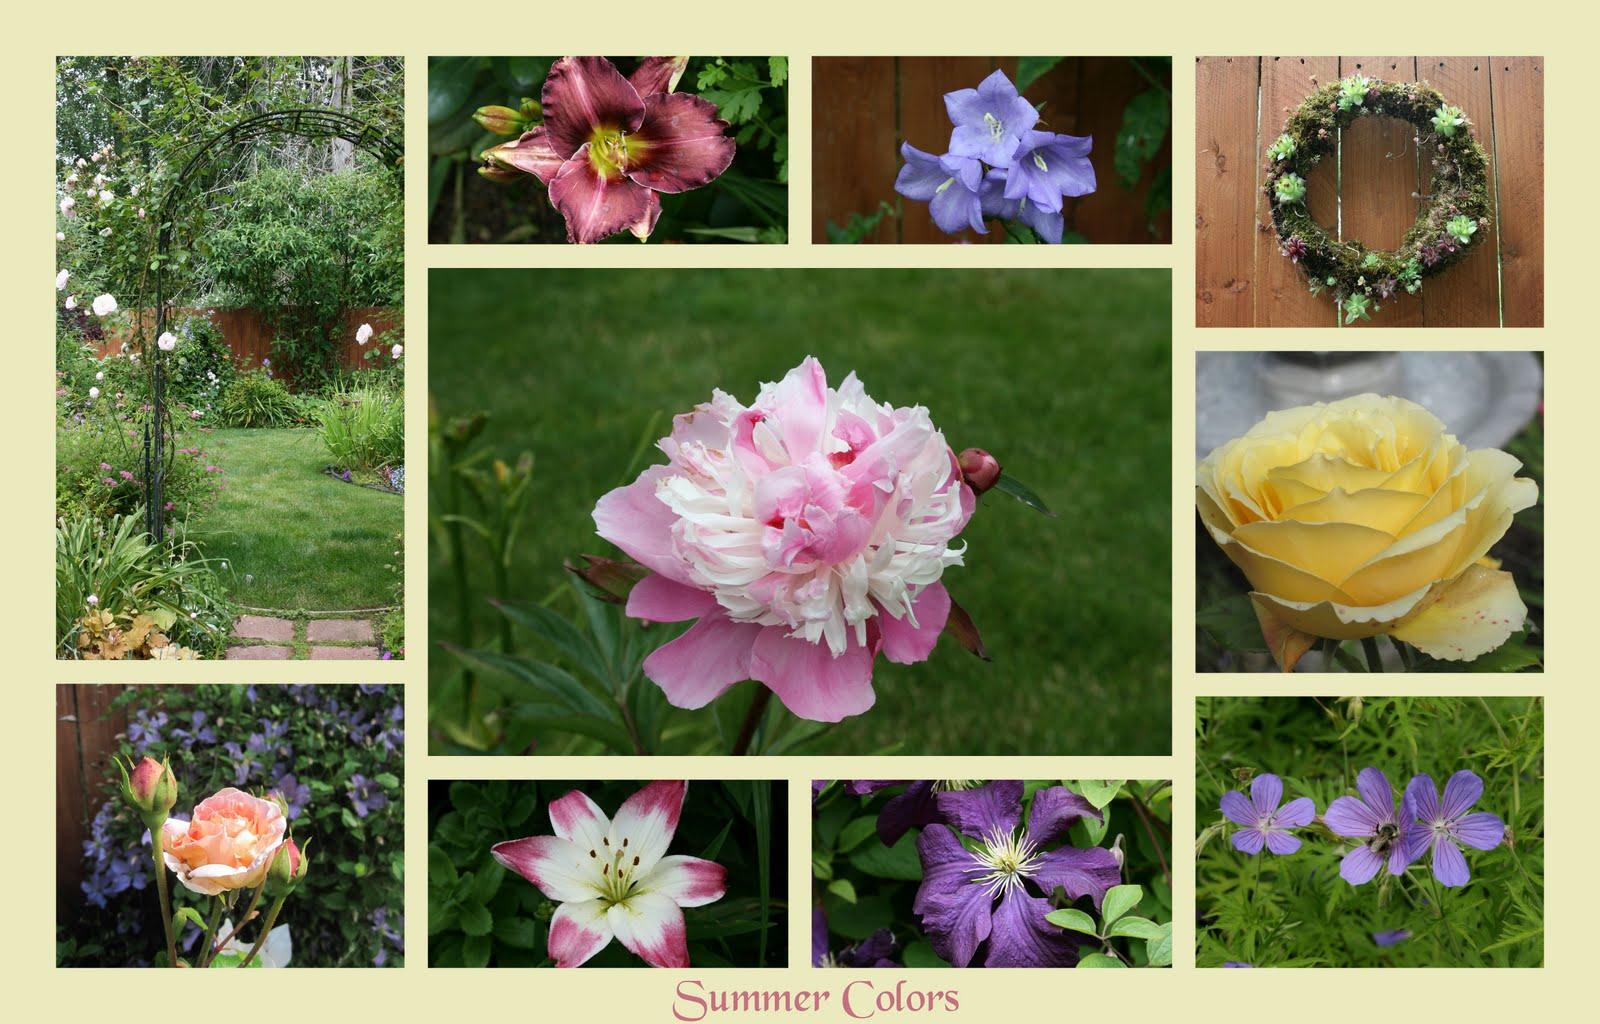 Kitchen Bouquet: June 2010